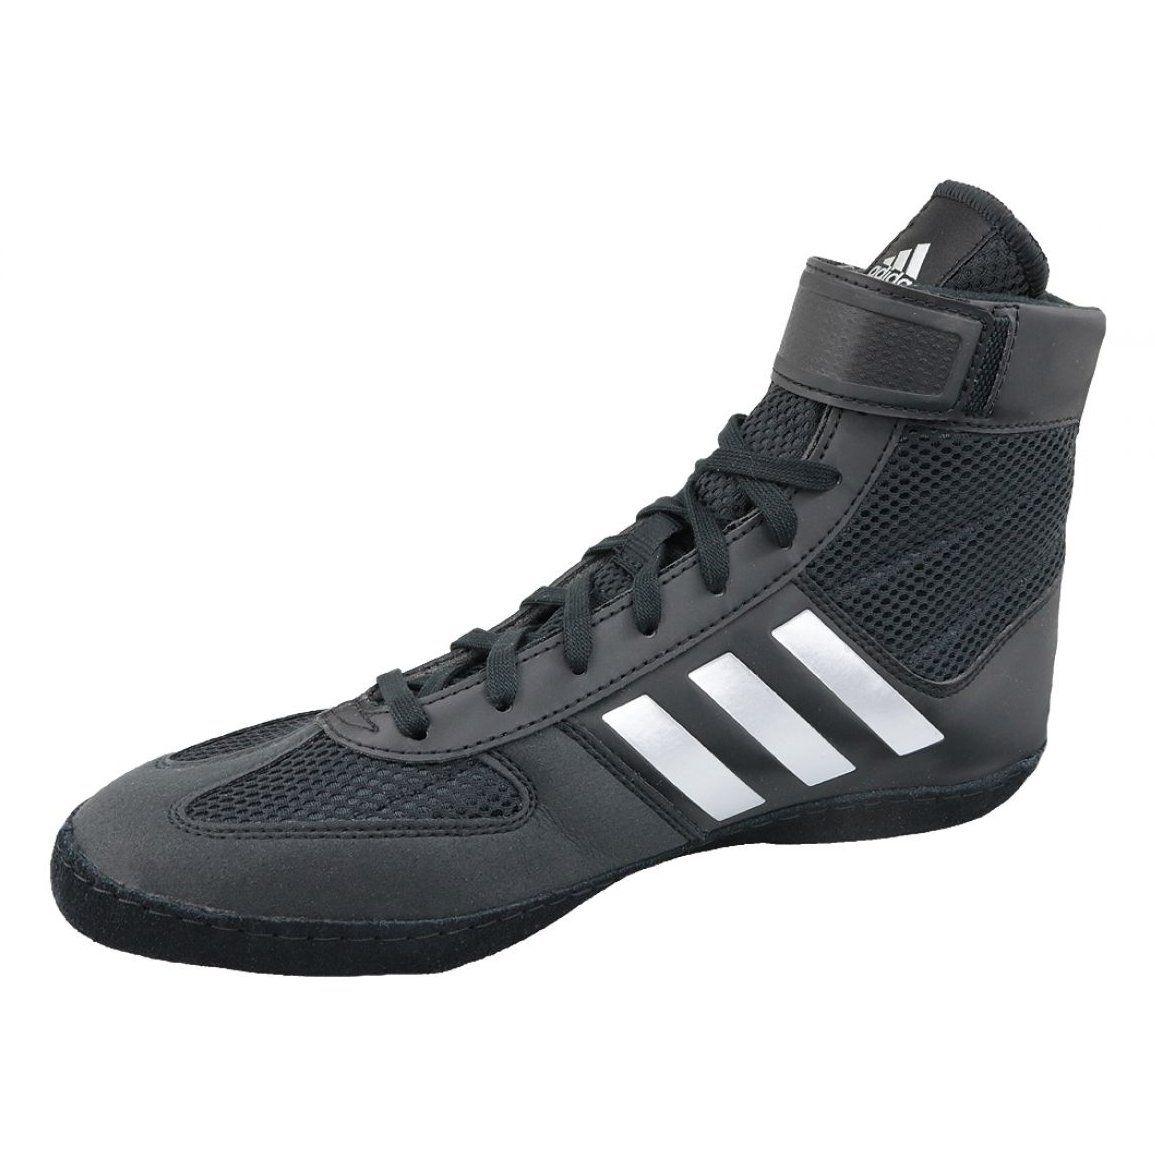 Buty Adidas Combat Speed 5 M Ba8007 Czarne Sports Shoes Adidas Black Shoes Adidas Brand